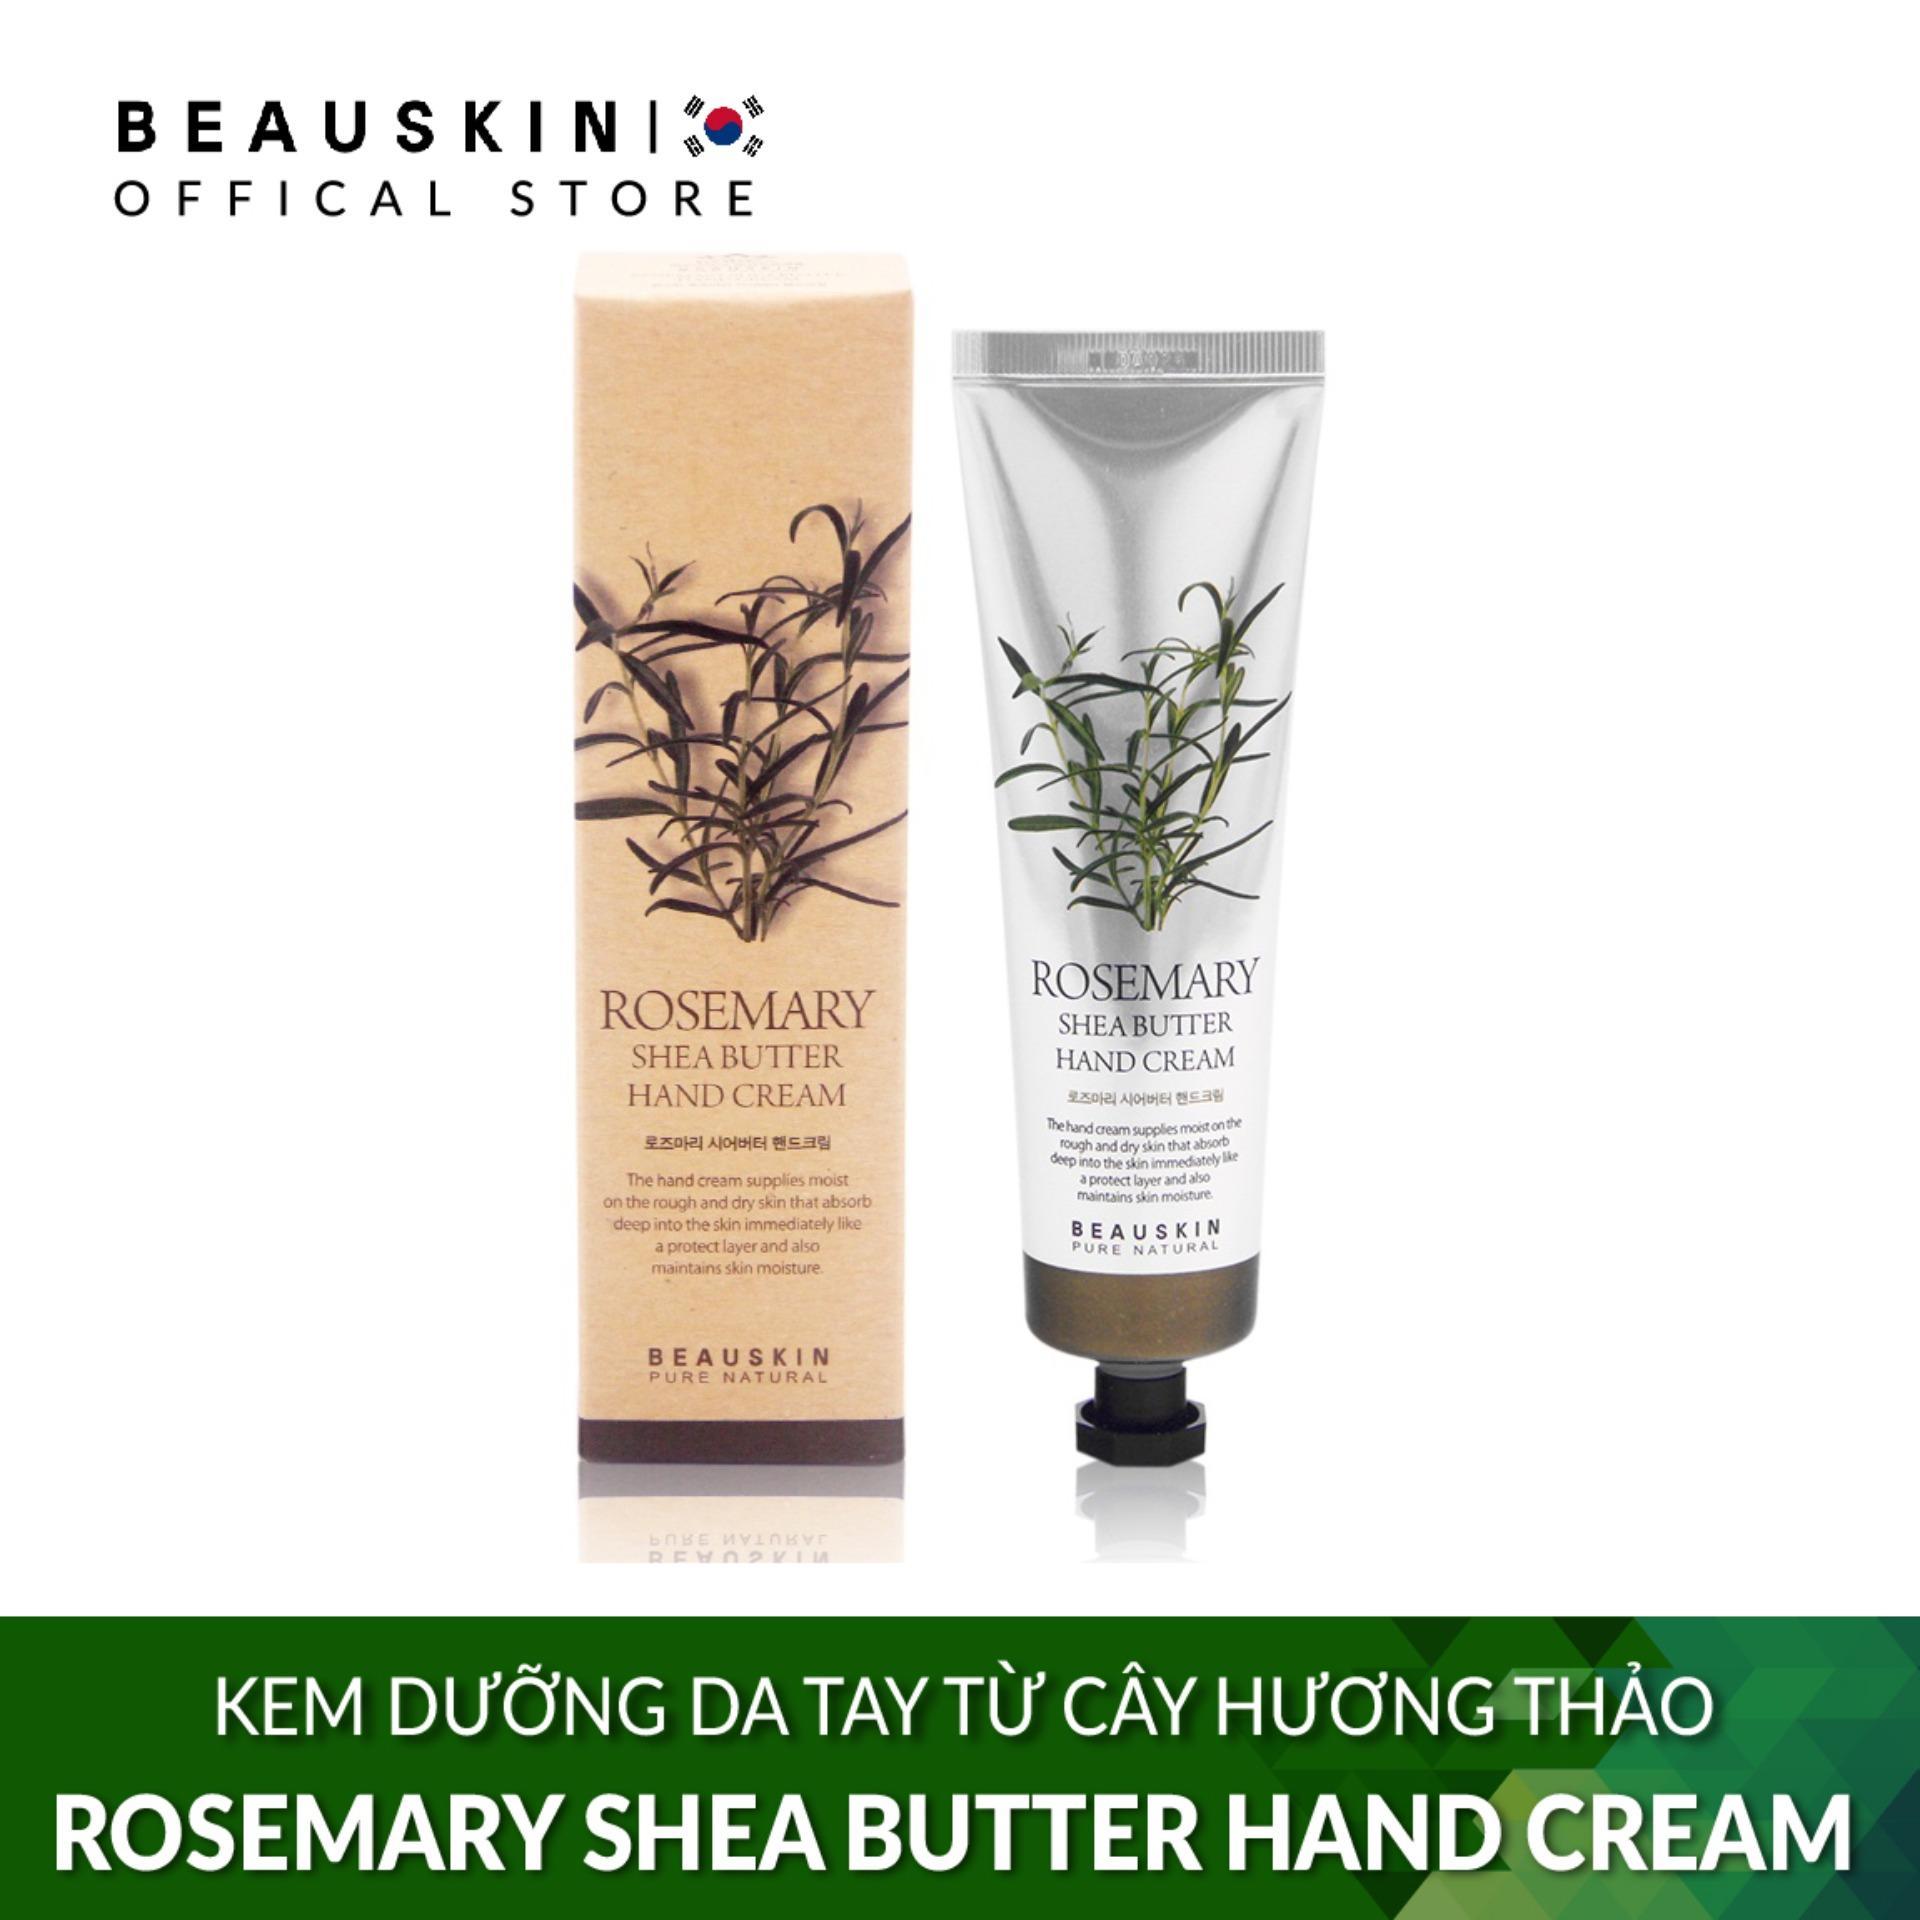 Kem dưỡng da tay từ cây hương thảo Beauskin Rosemary Shea Butter Hand Cream 100ml